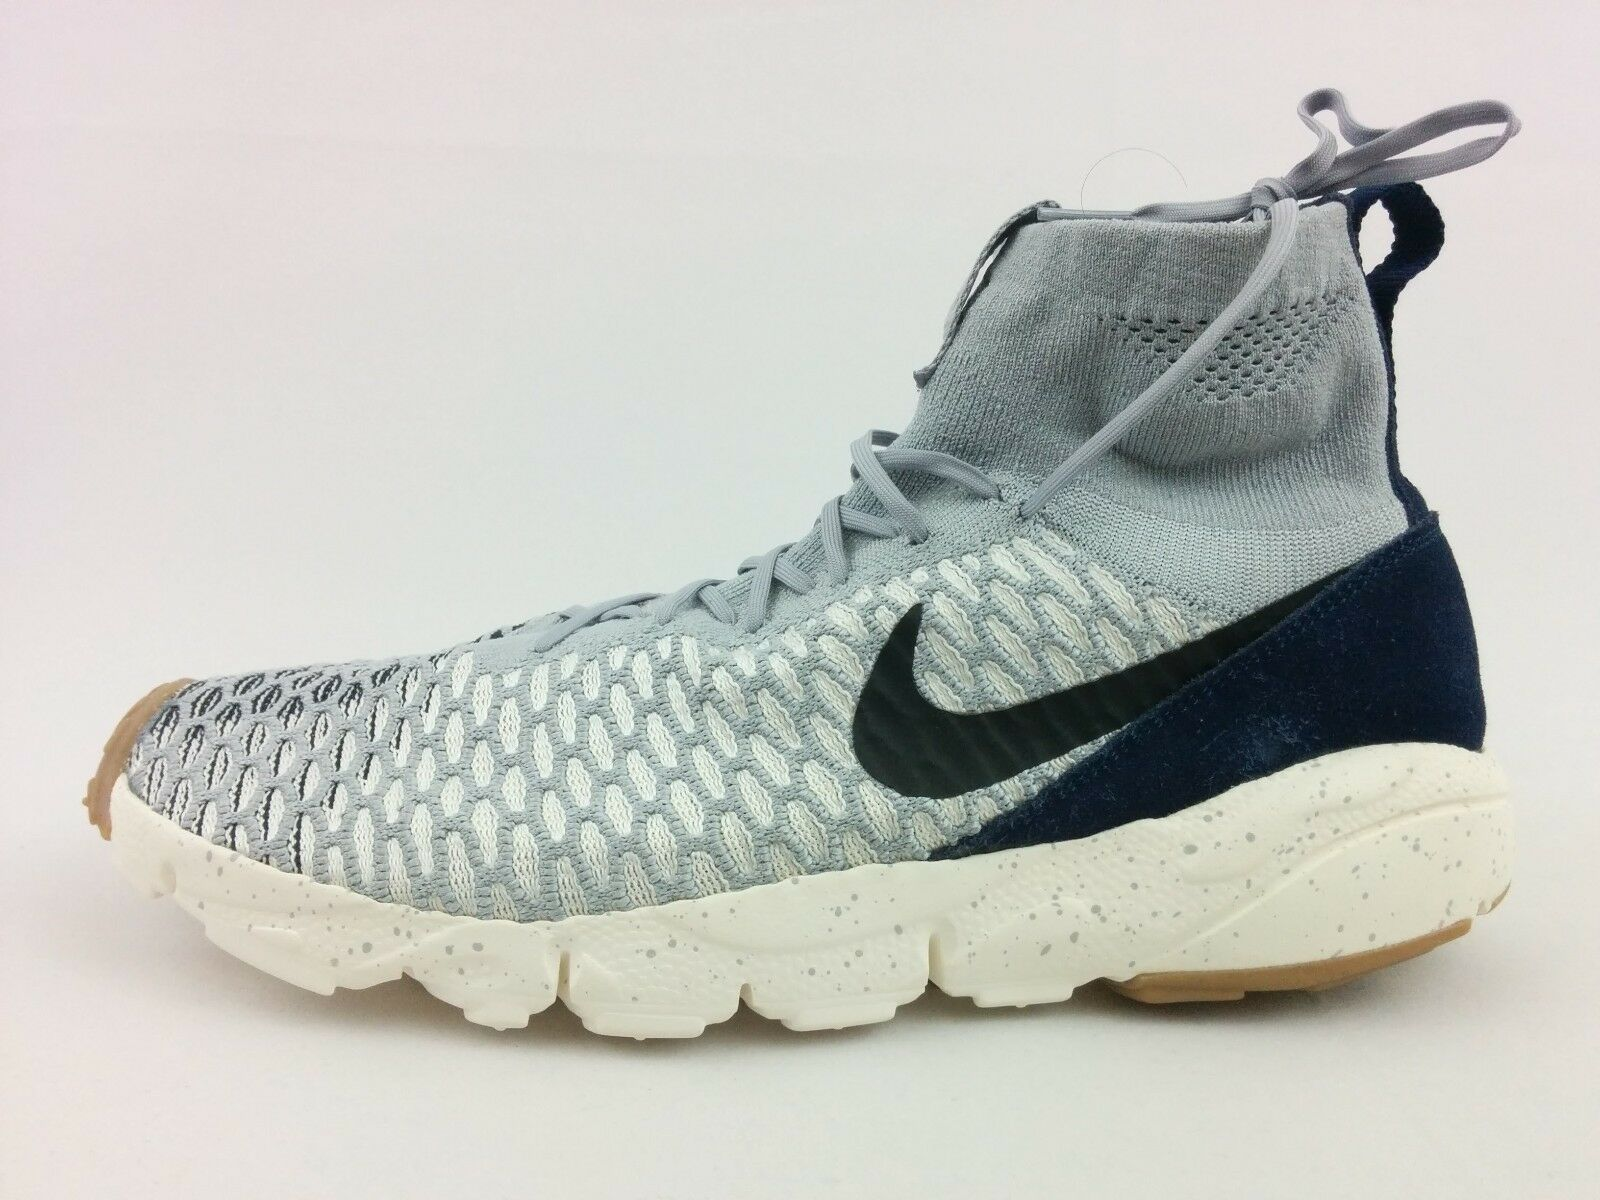 Nike Footscape Magista Grey Flyknit SIZE 11.5 Wolf Grey Magista Obsidian Sail 816560-001 d7476c